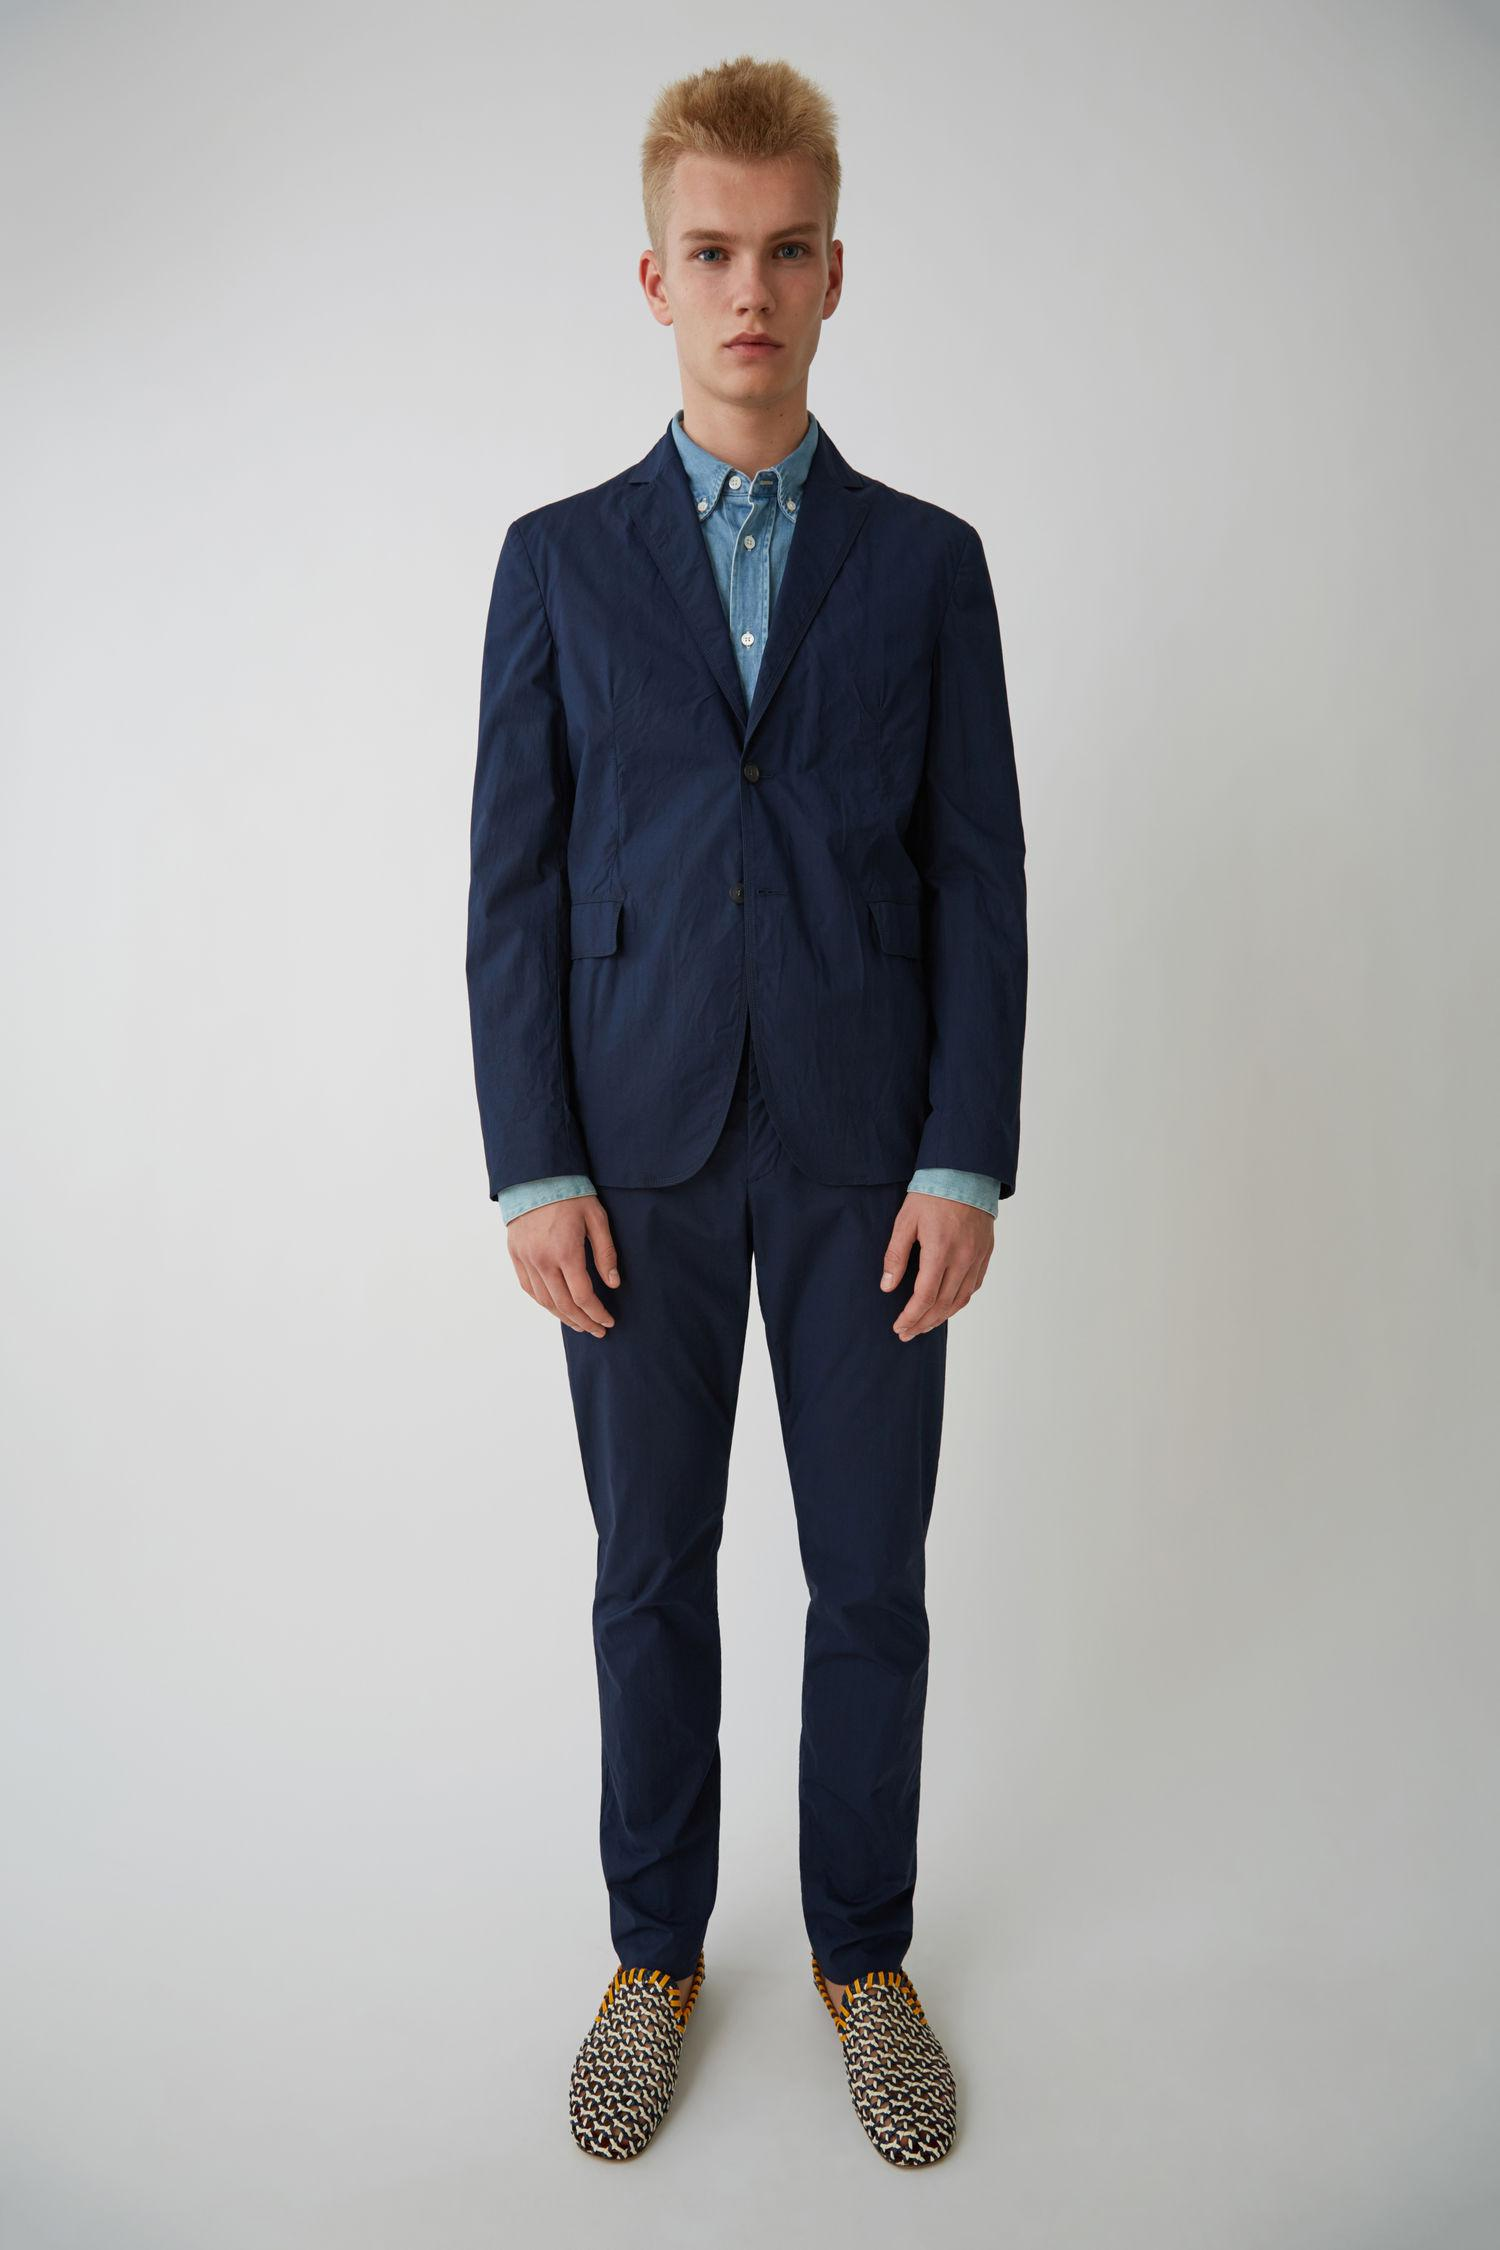 Acne Studios. Men's Blue Slim Fit Jacket navy